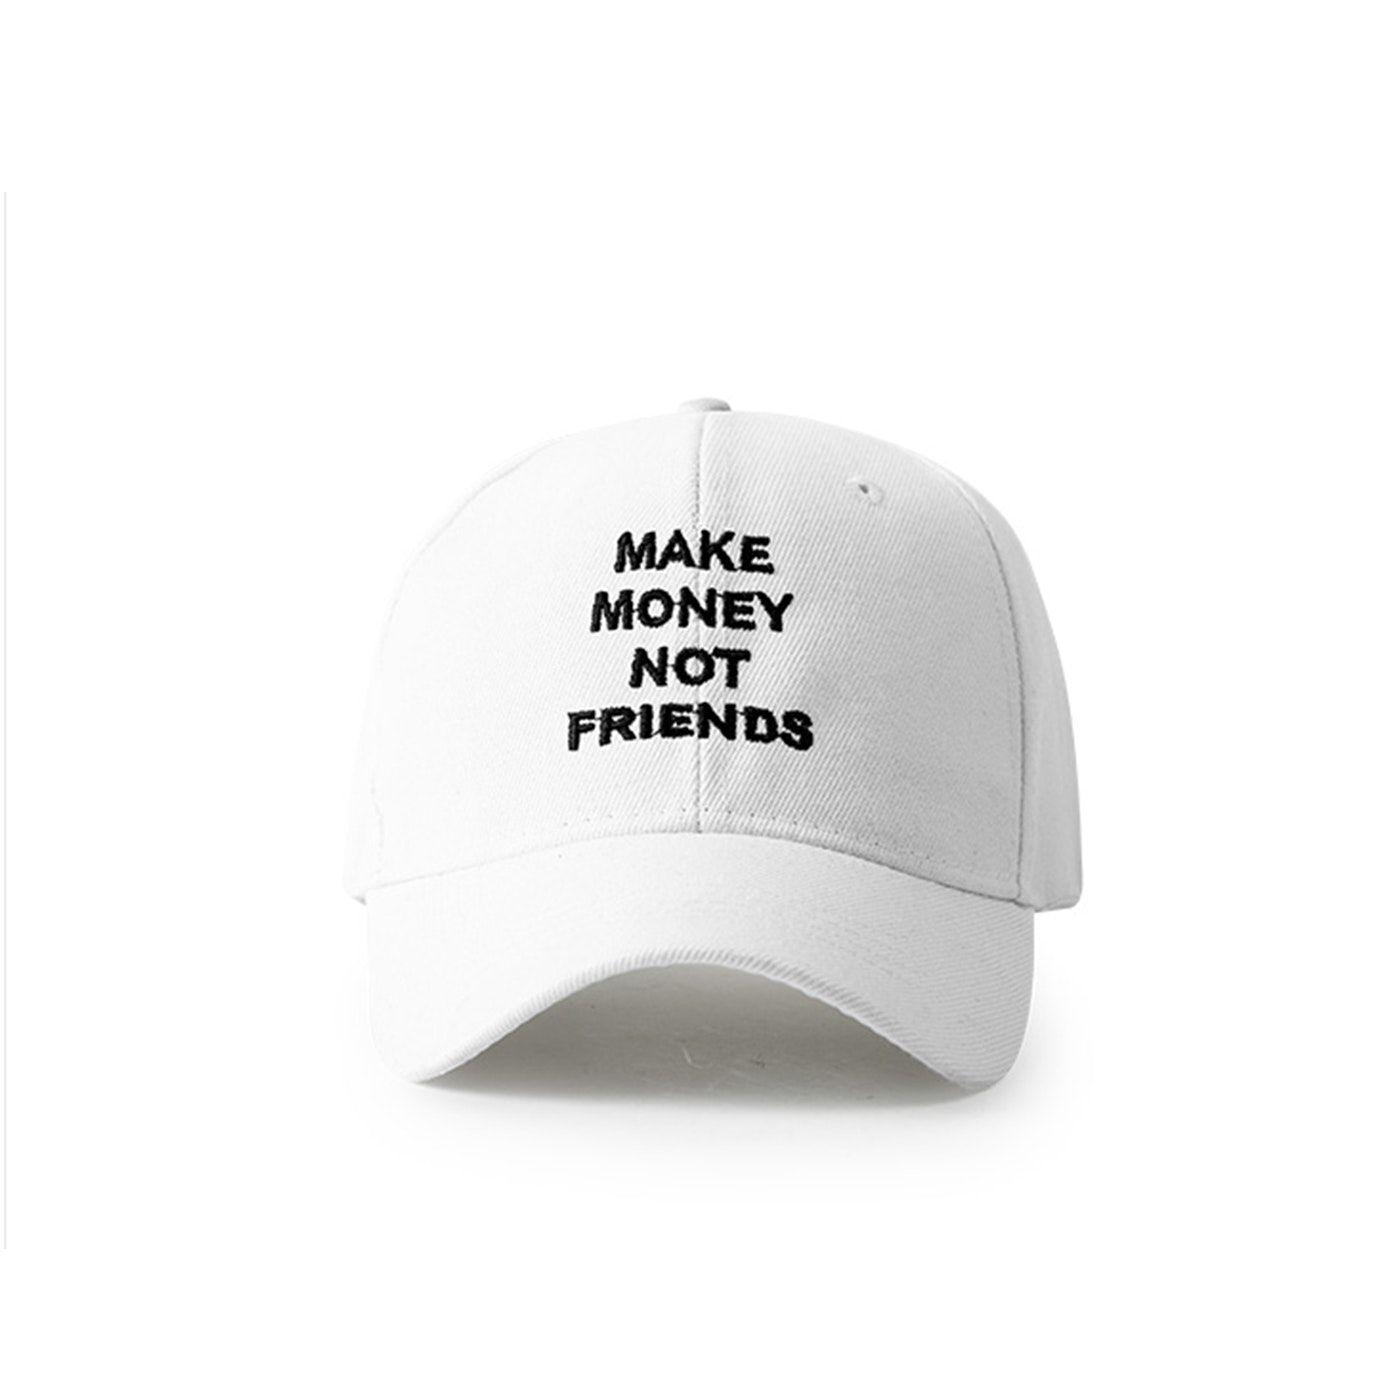 ACCESSORIES - Hats Make Money Not Friends MjAnD